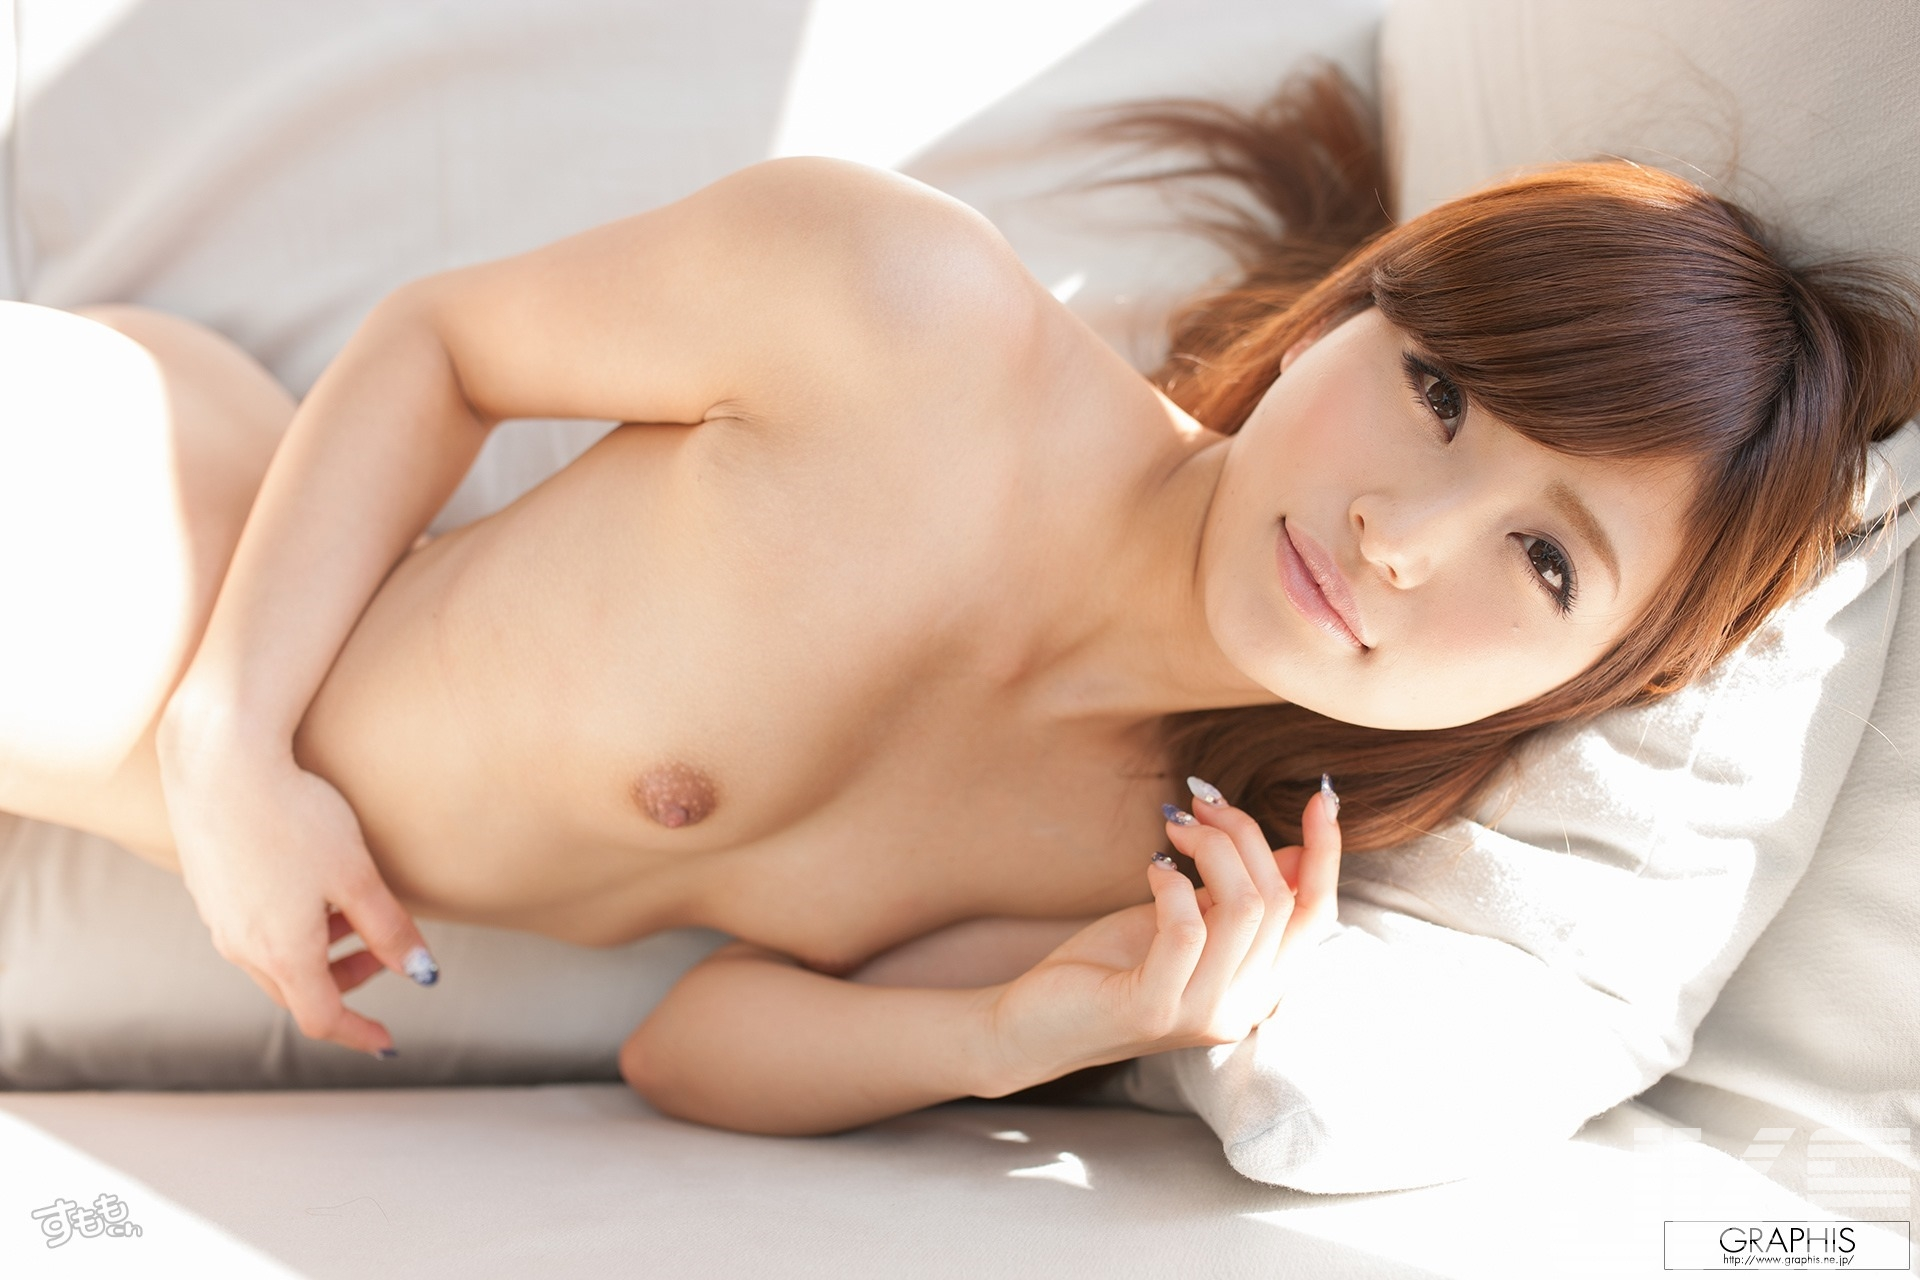 tachibana_harumi_5040-143.jpg